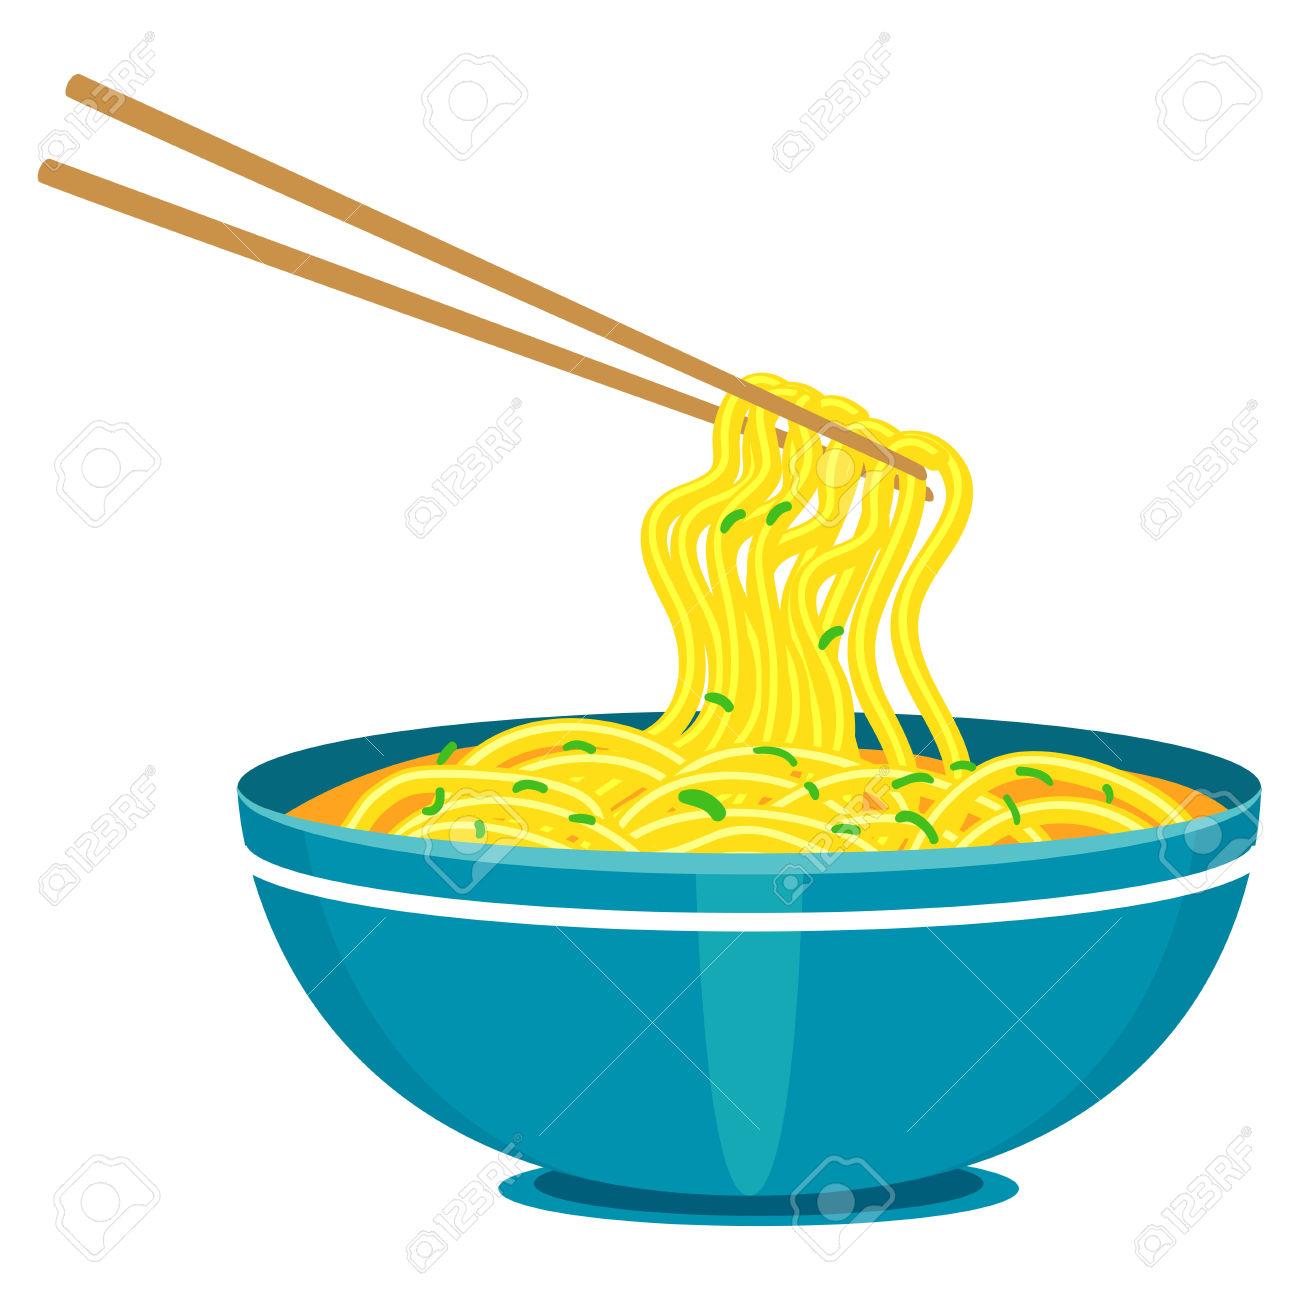 Noodles clipart svg royalty free stock Noodles clipart 8 » Clipart Station svg royalty free stock